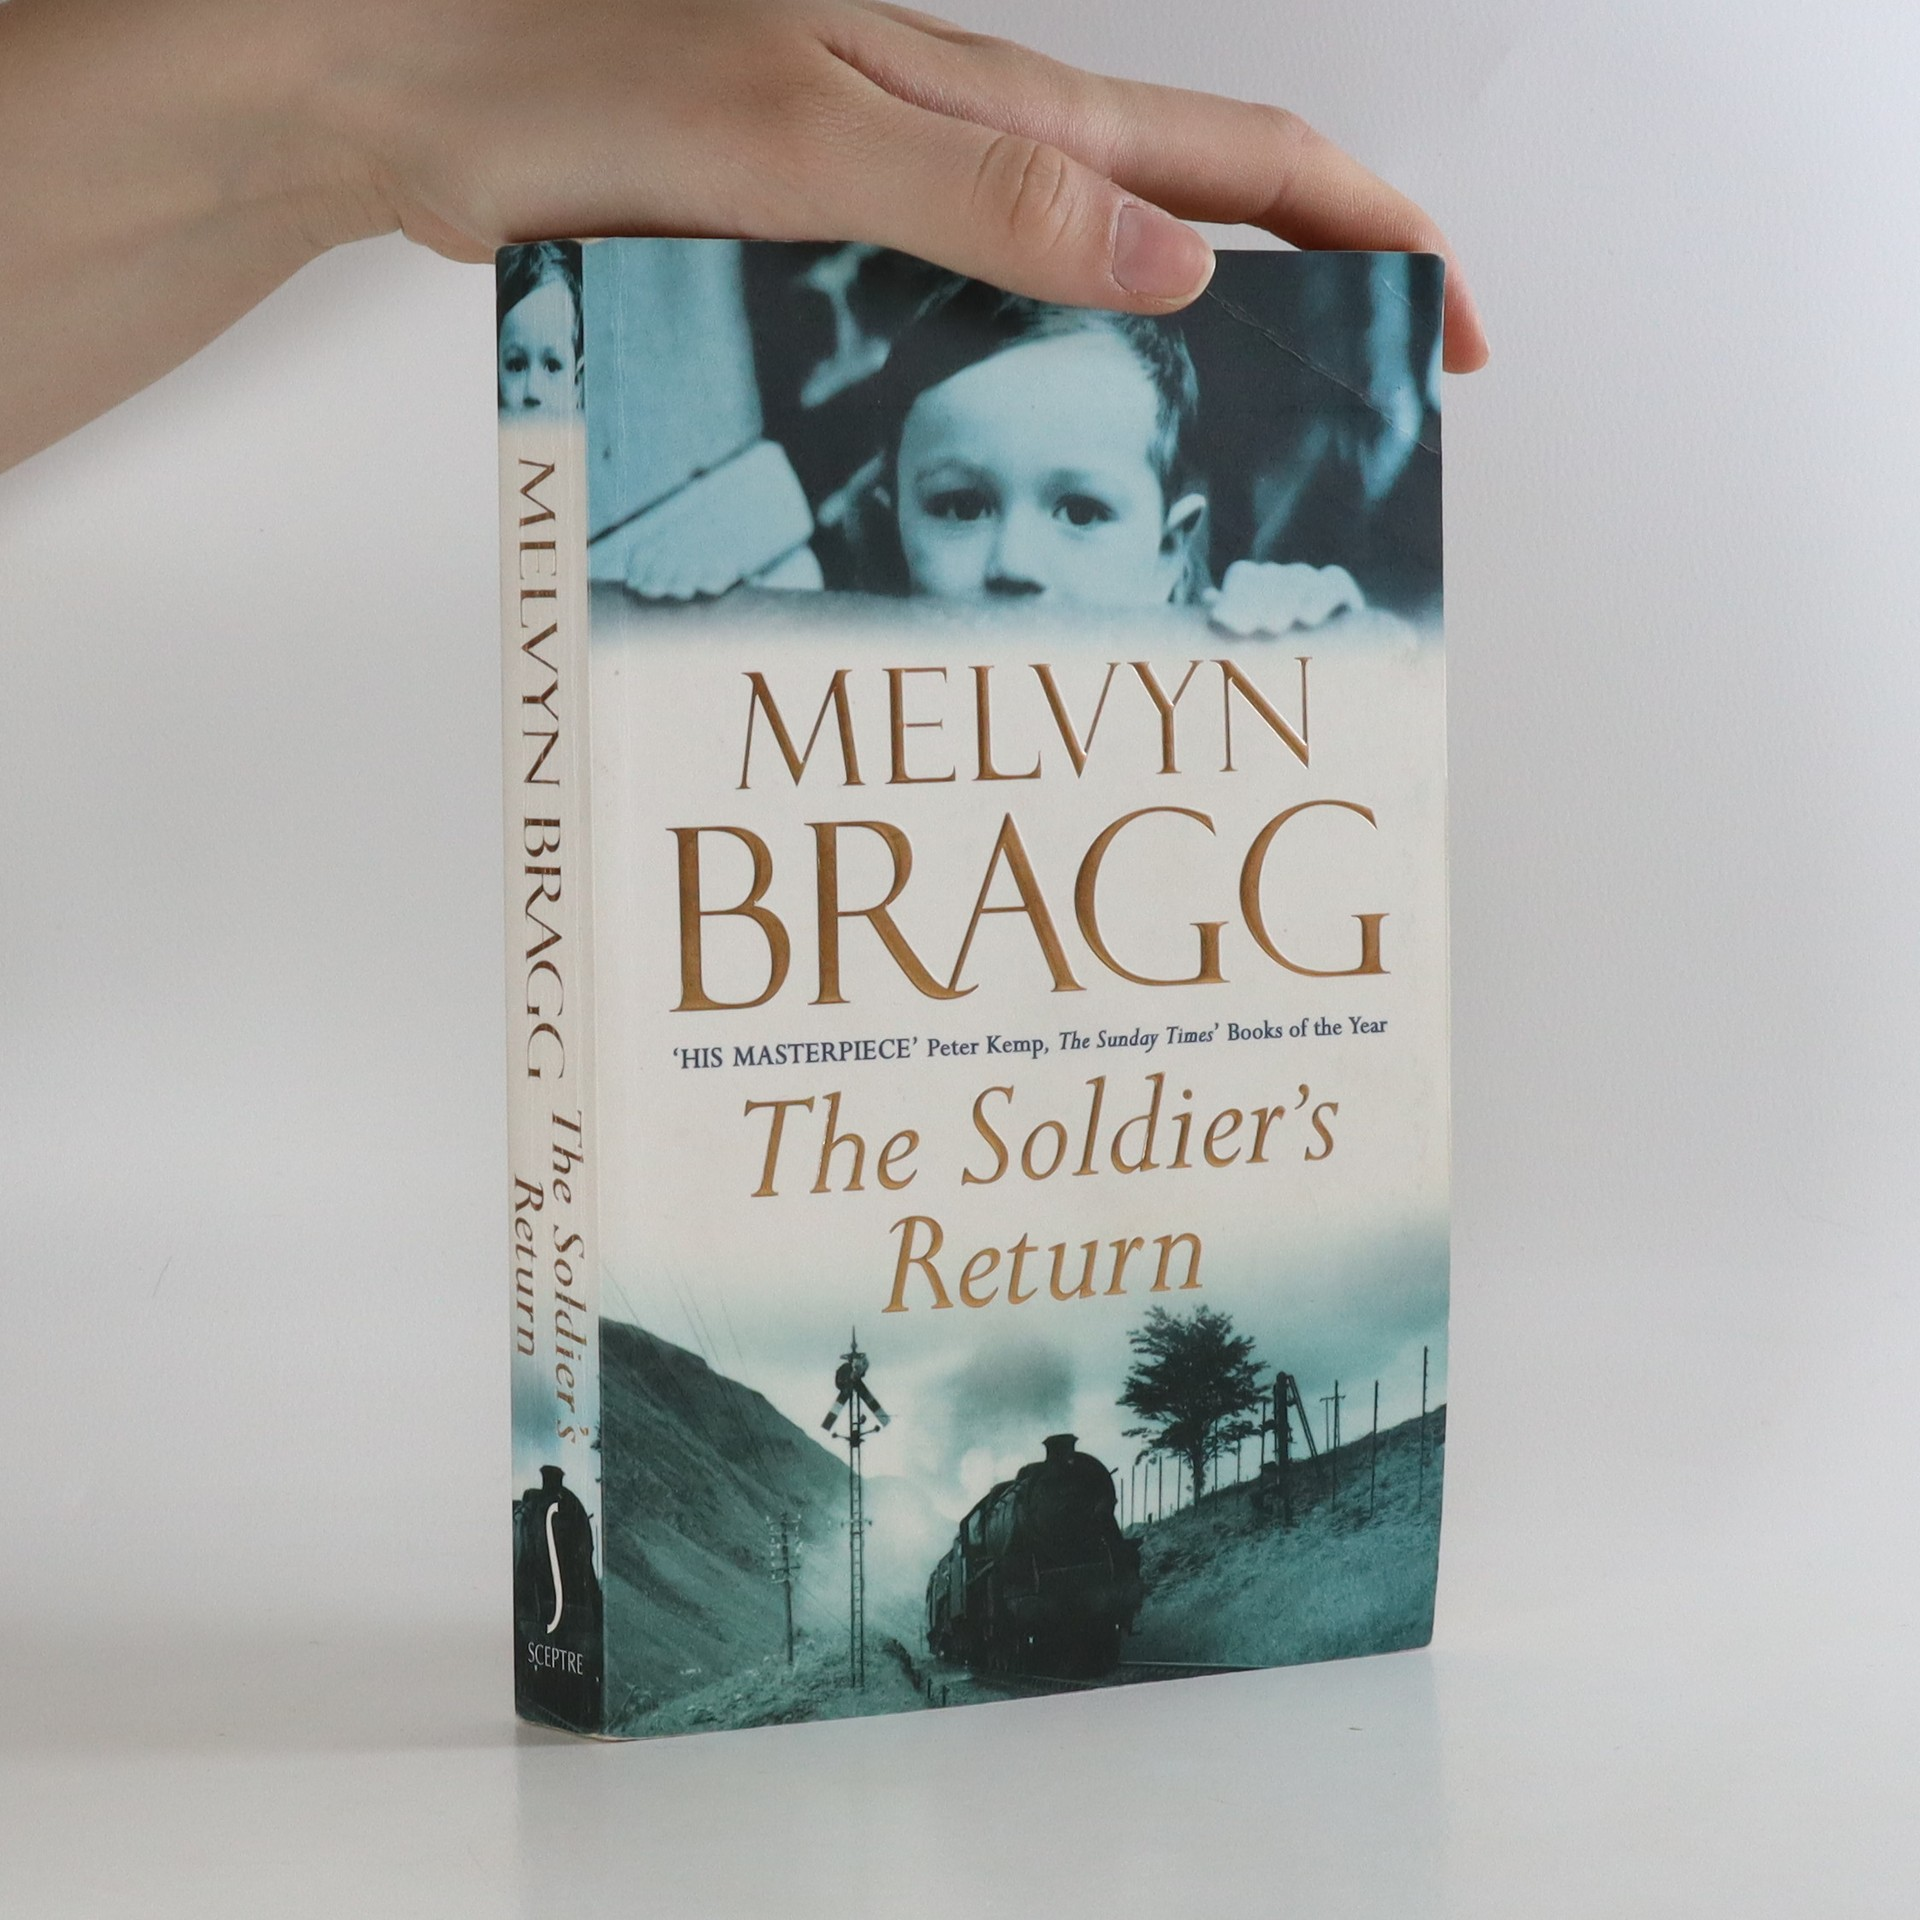 antikvární kniha The soldier's return, 1999